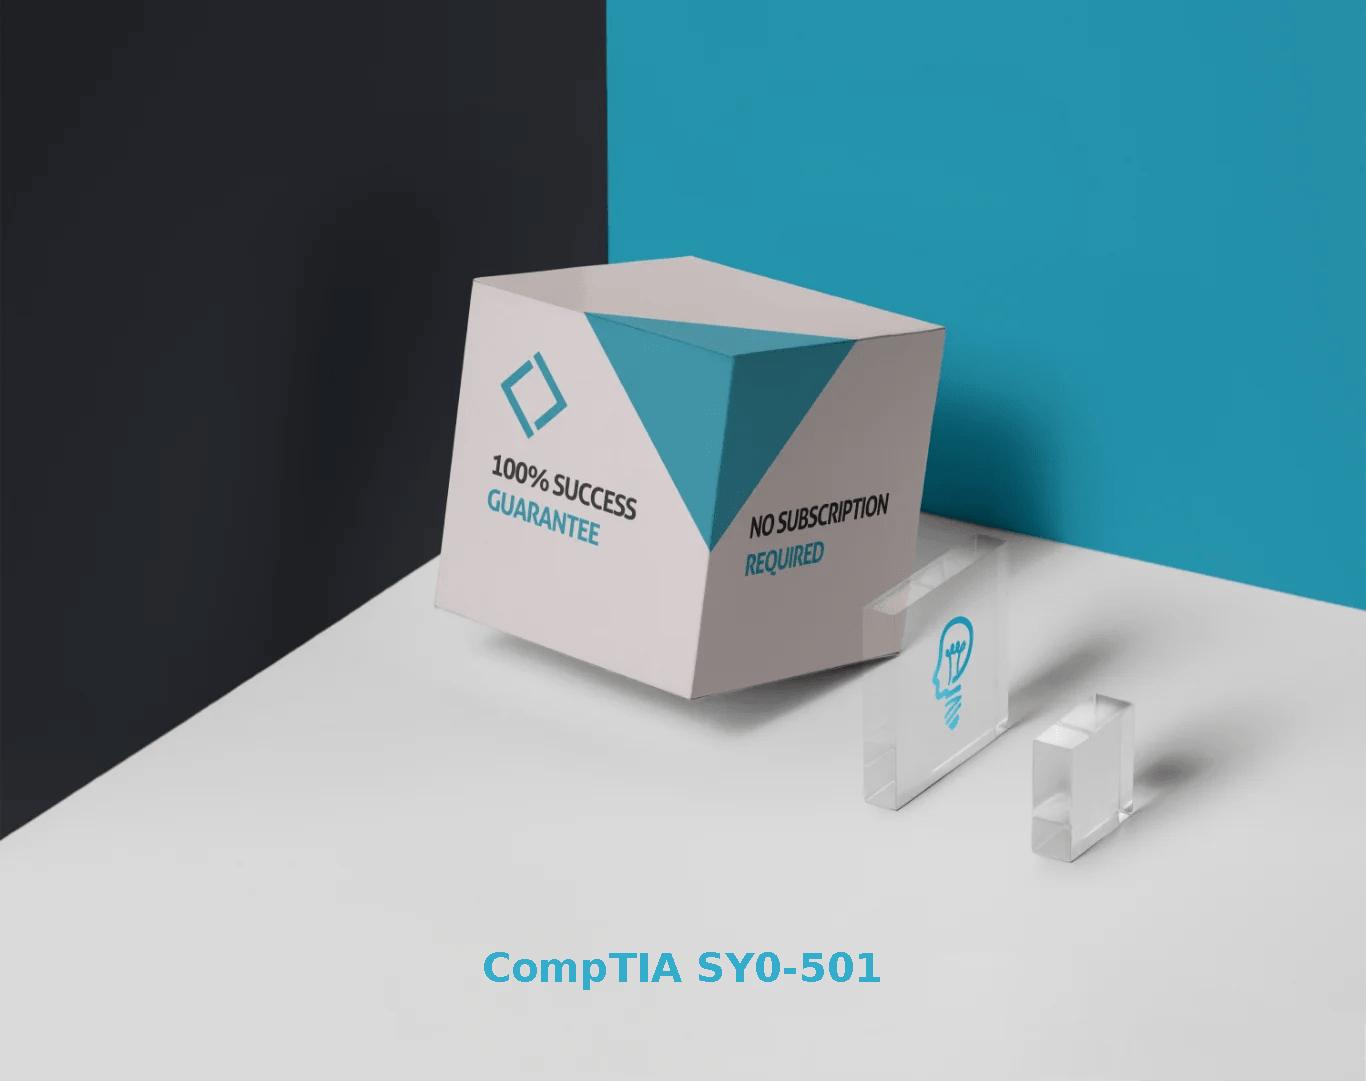 CompTIA SY0-501 Exams